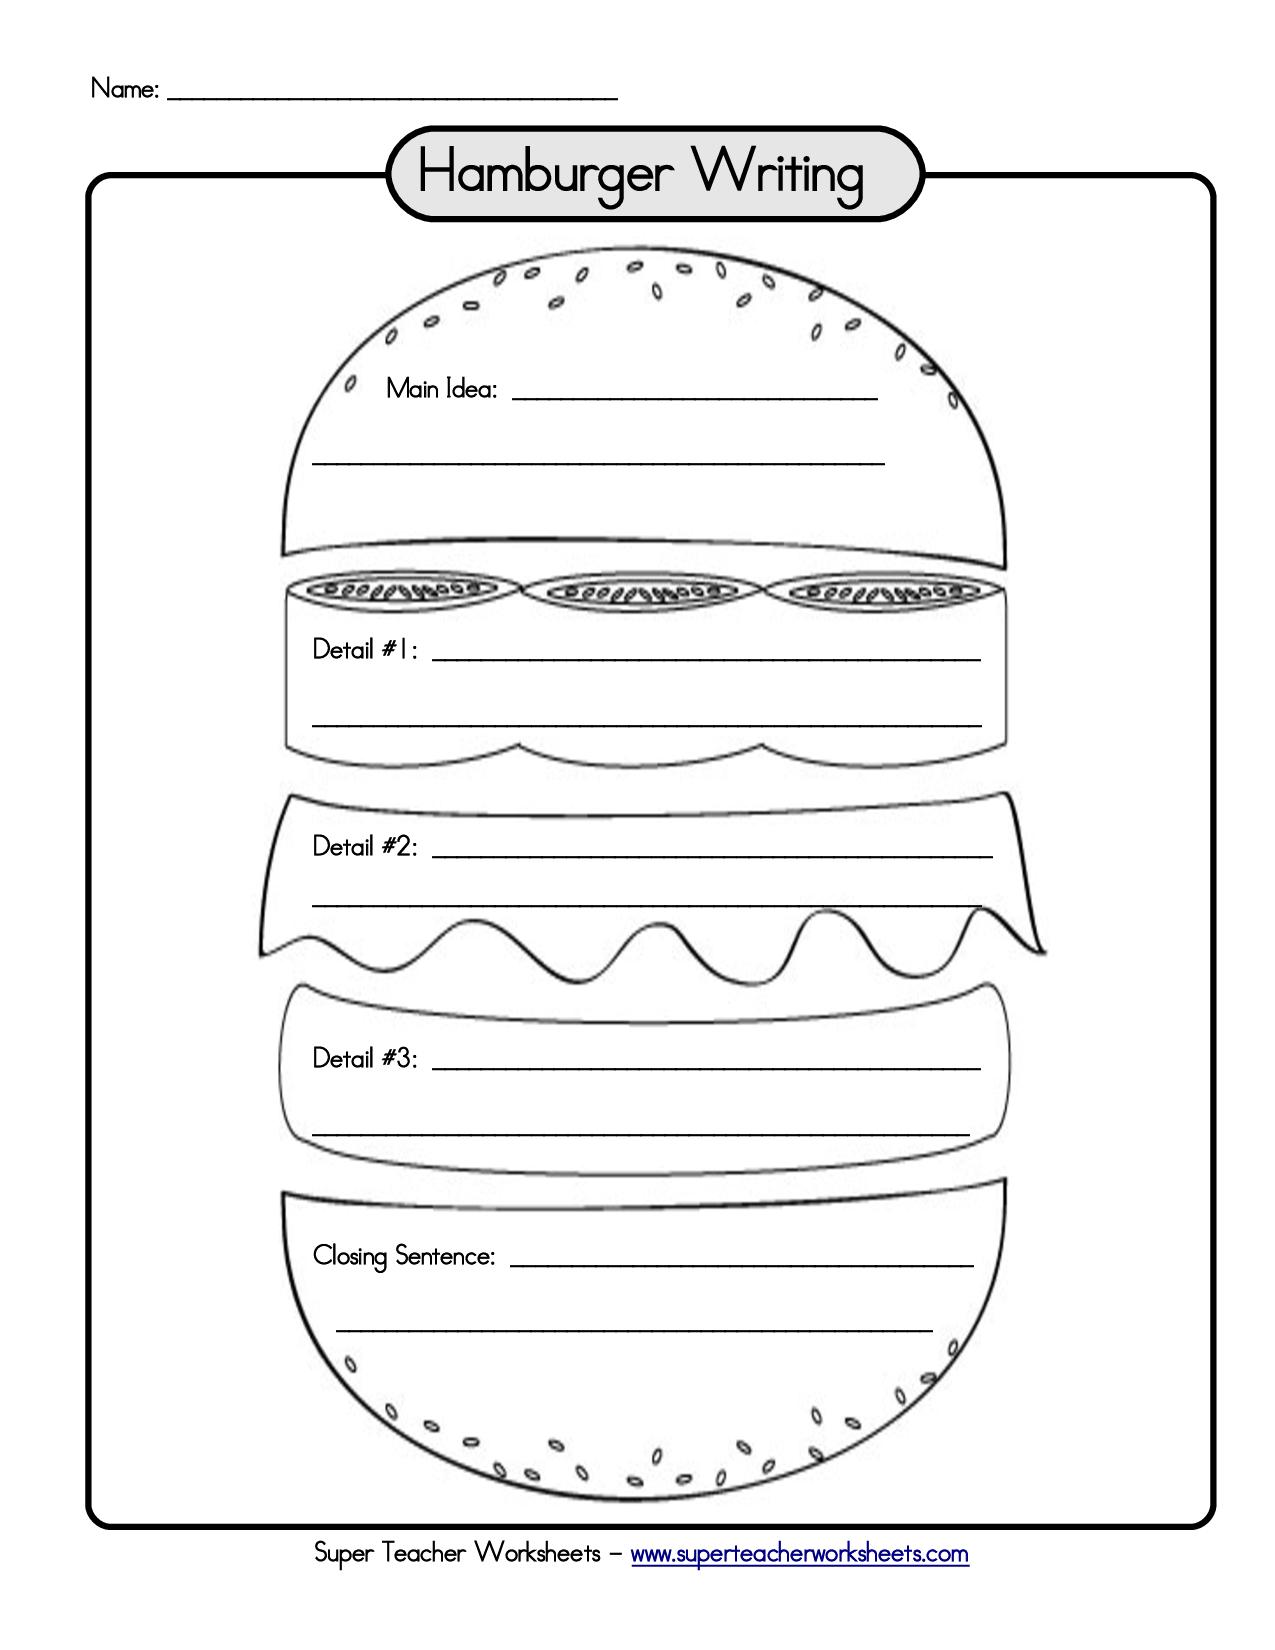 Hamburger Graphic Organizer Writing Paragraph Links To A